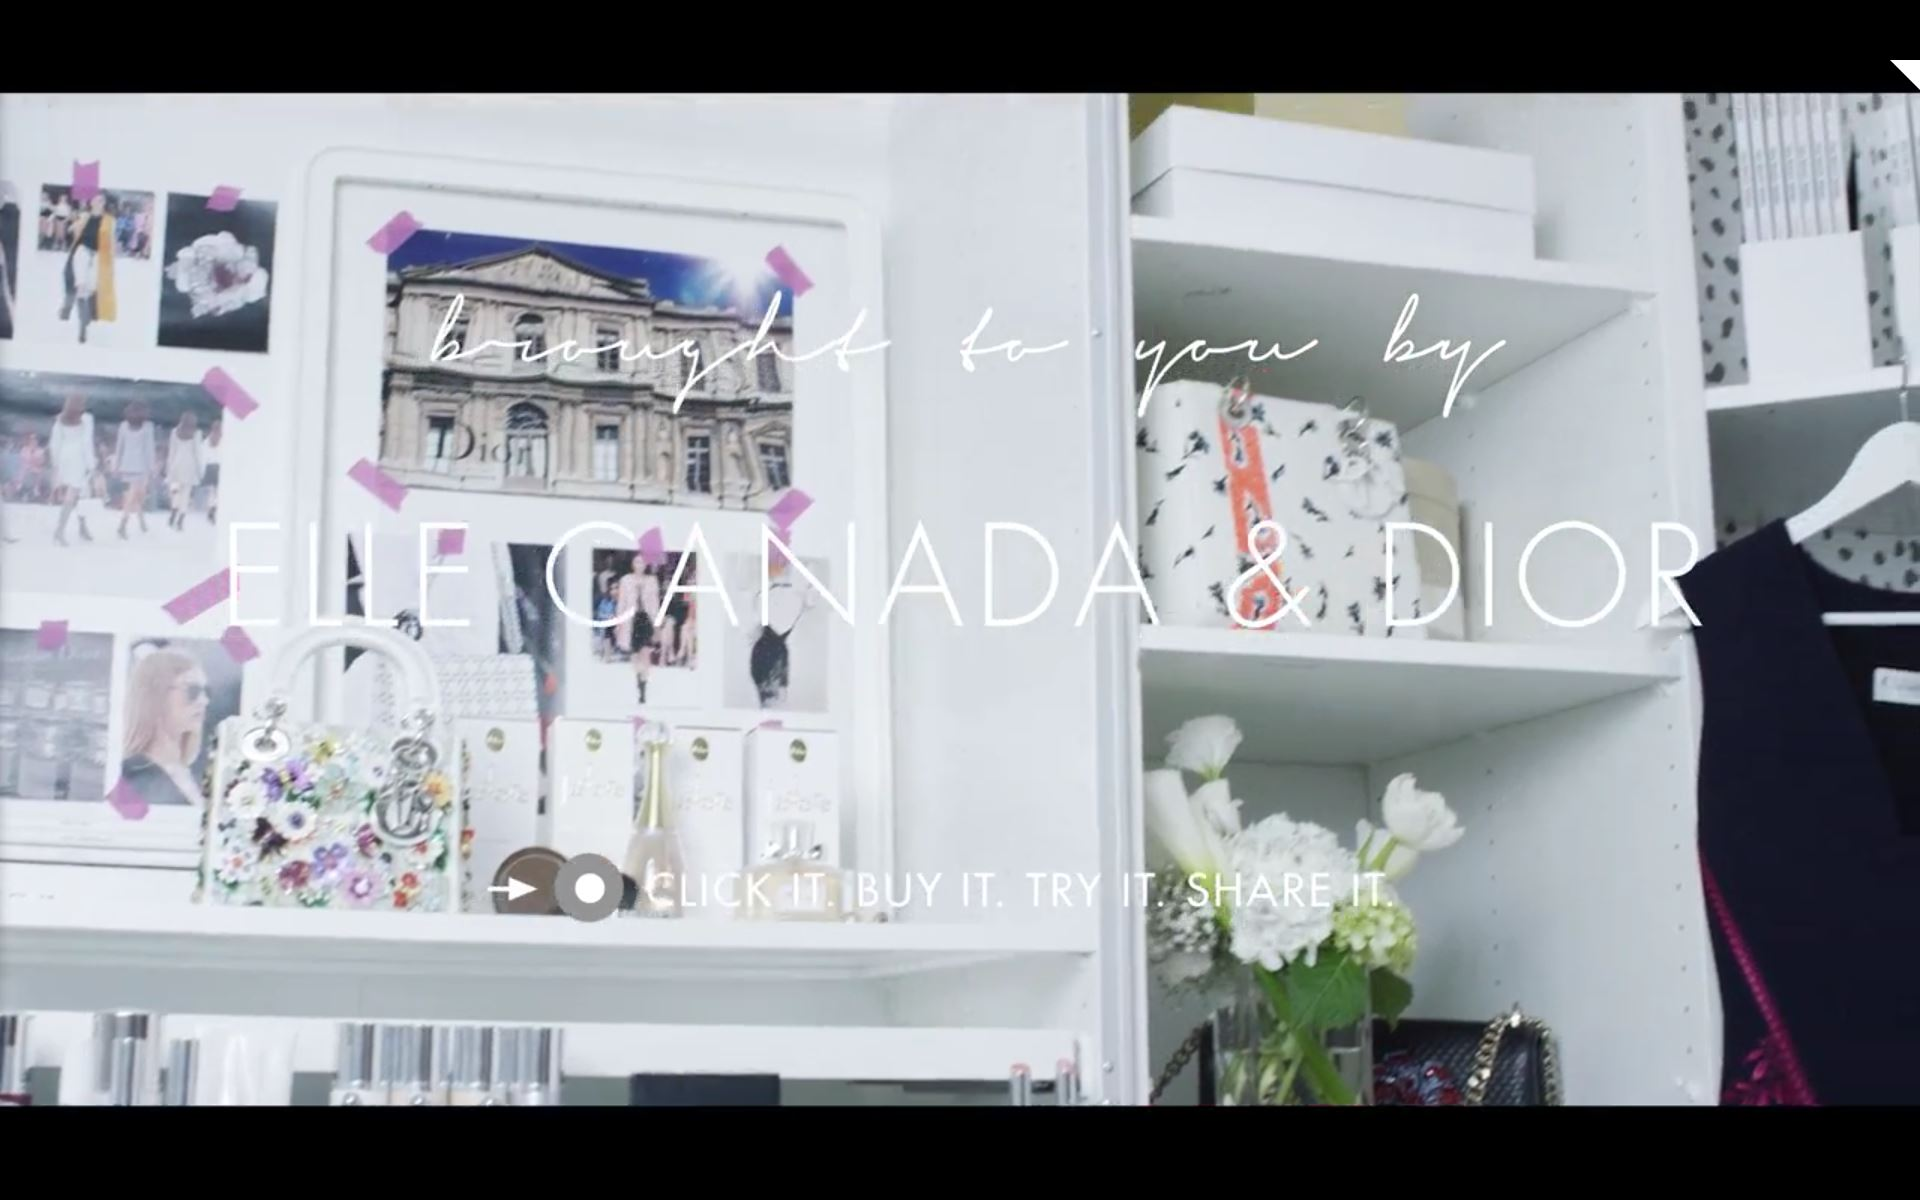 Elle Canada & Dior.JPG